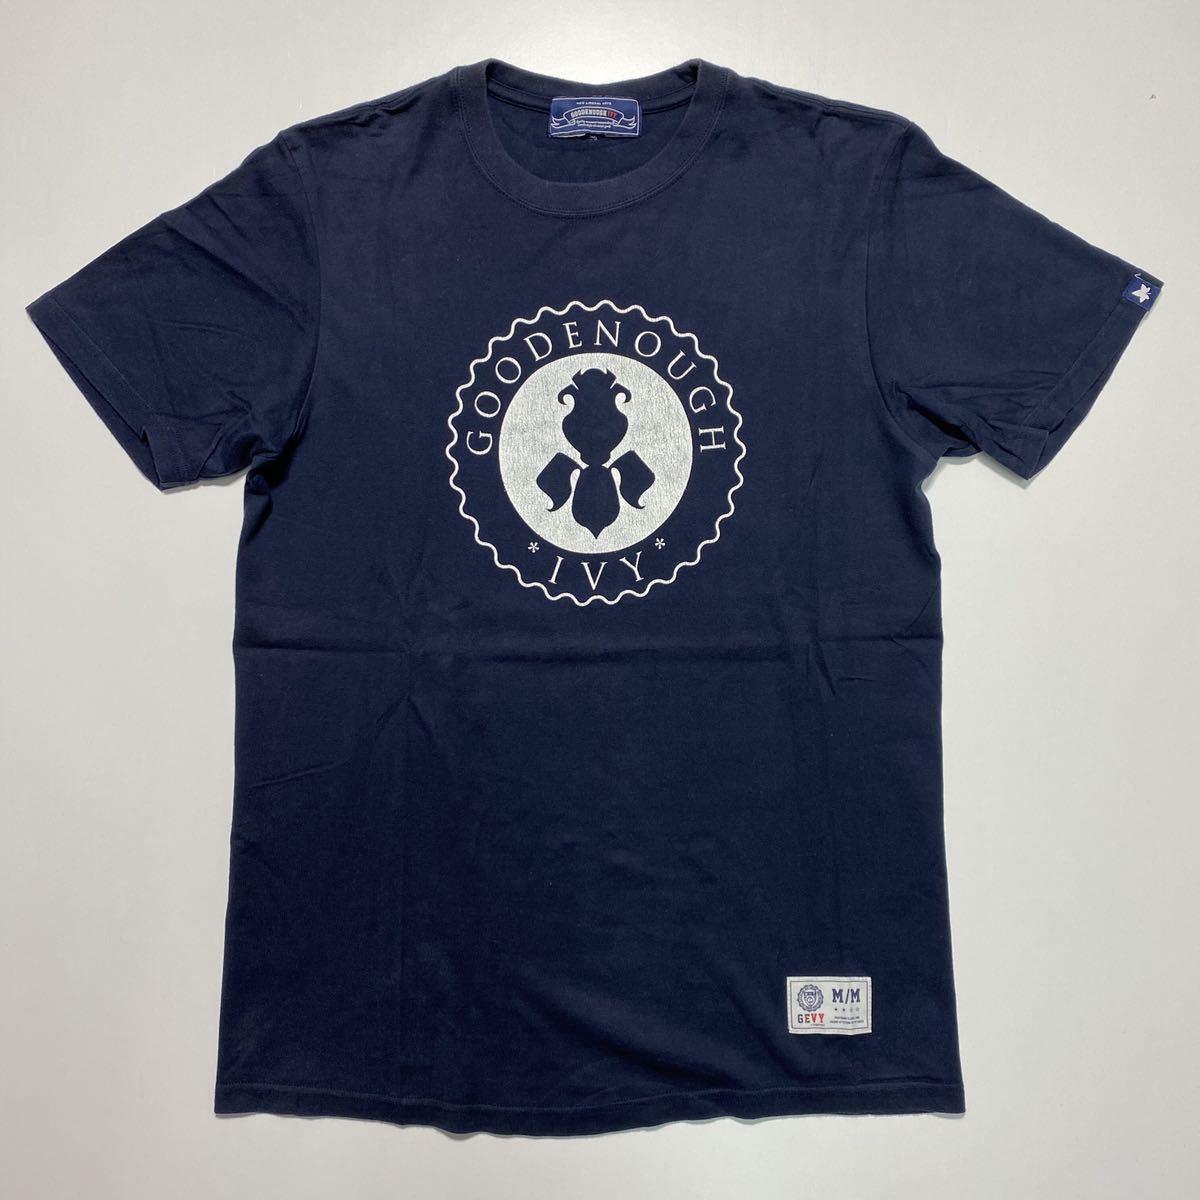 【M】GOODENOUGH IVY FRAGMENT DESIGN CIRCLE LOGO TEE グッドイナフ フラグメントデザイン アイビー サークル ロゴ Tシャツ G478_画像1